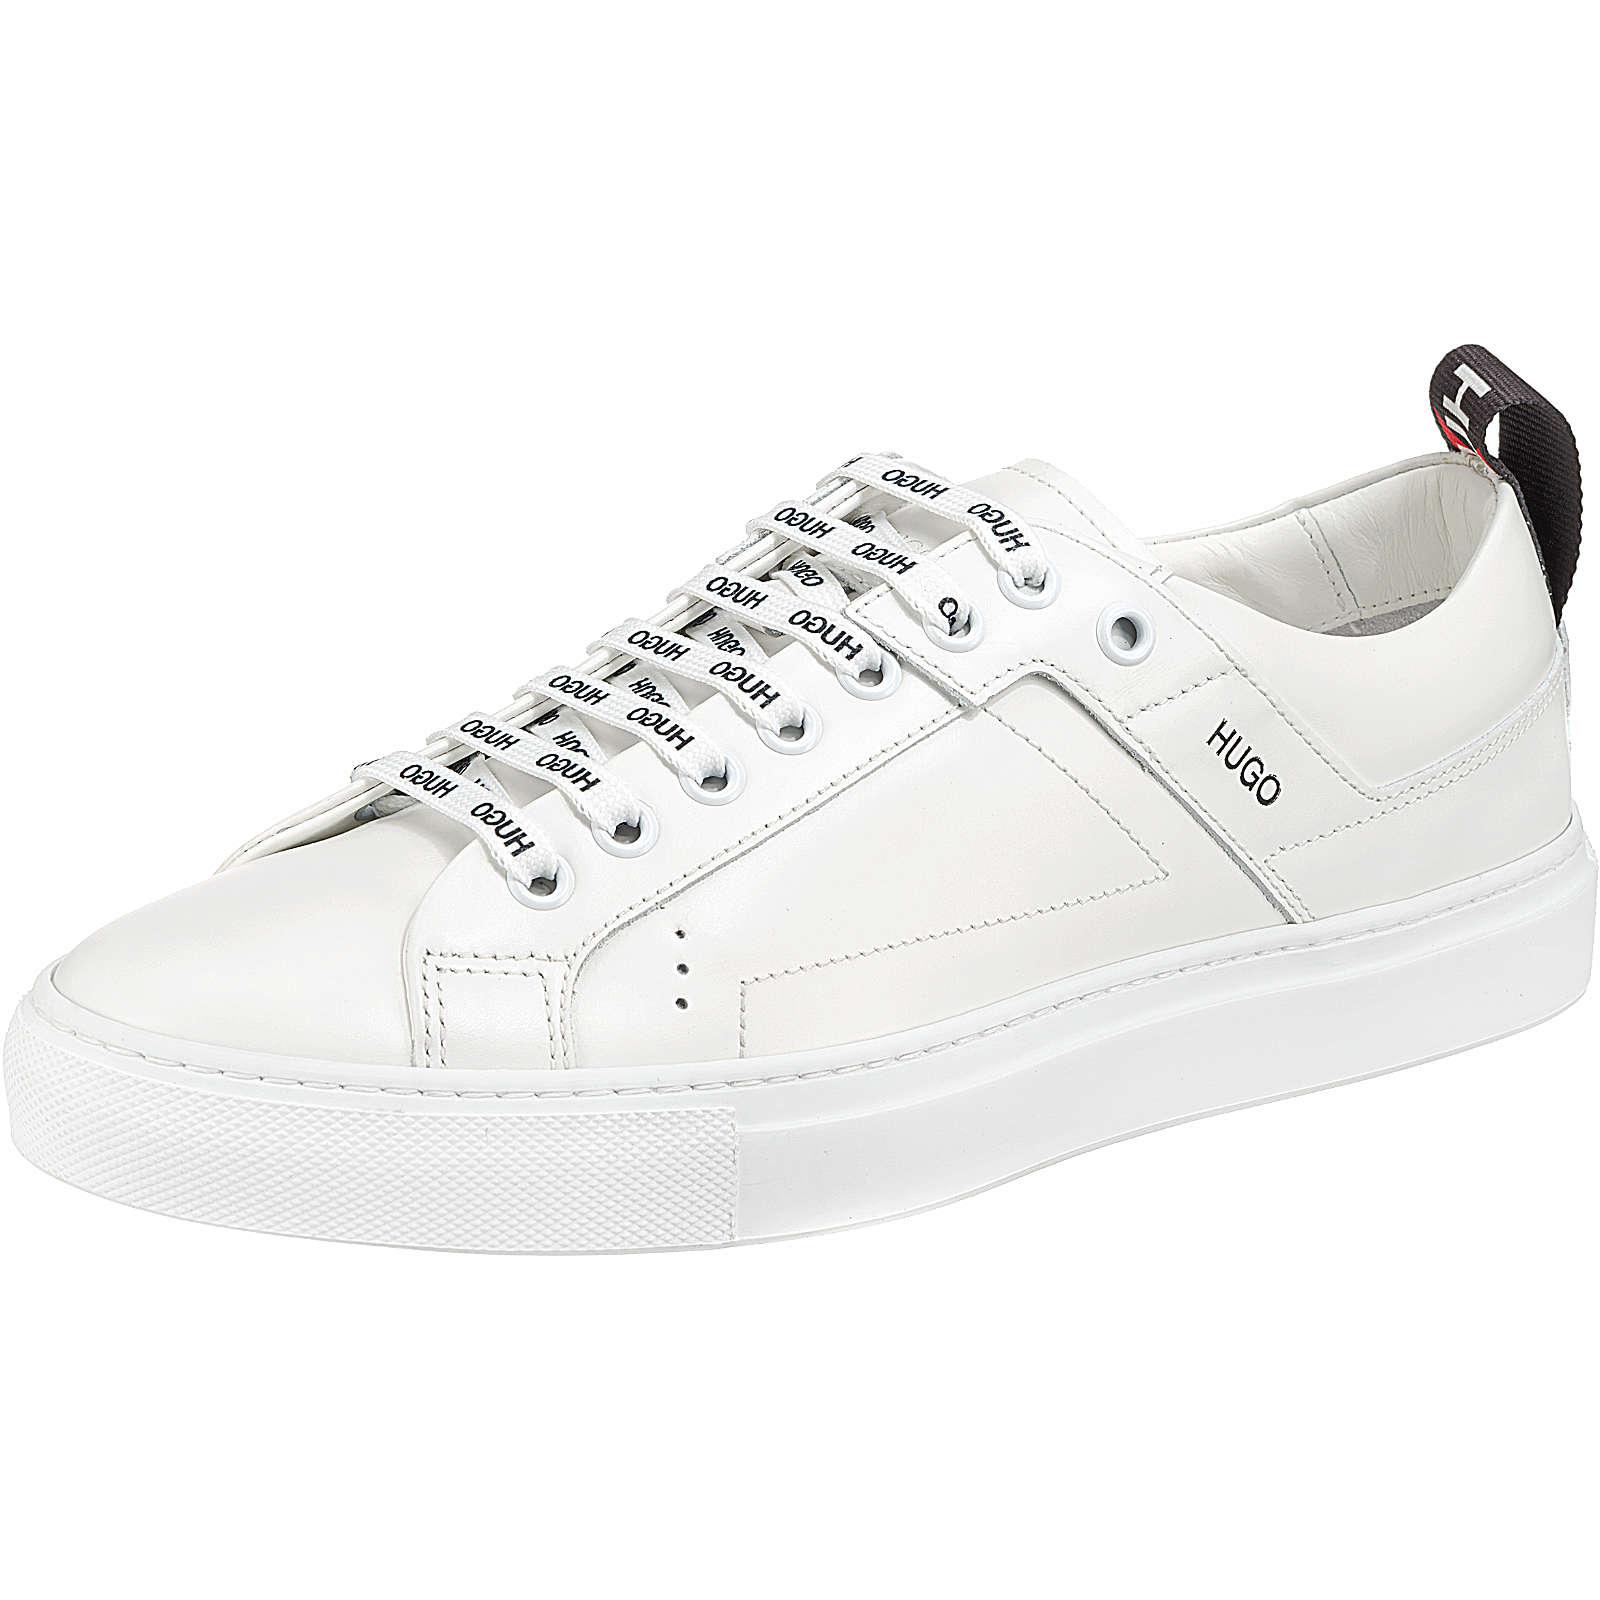 HUGO Model ´´Mayfair´´ Sneakers Low weiß Damen Gr. 39